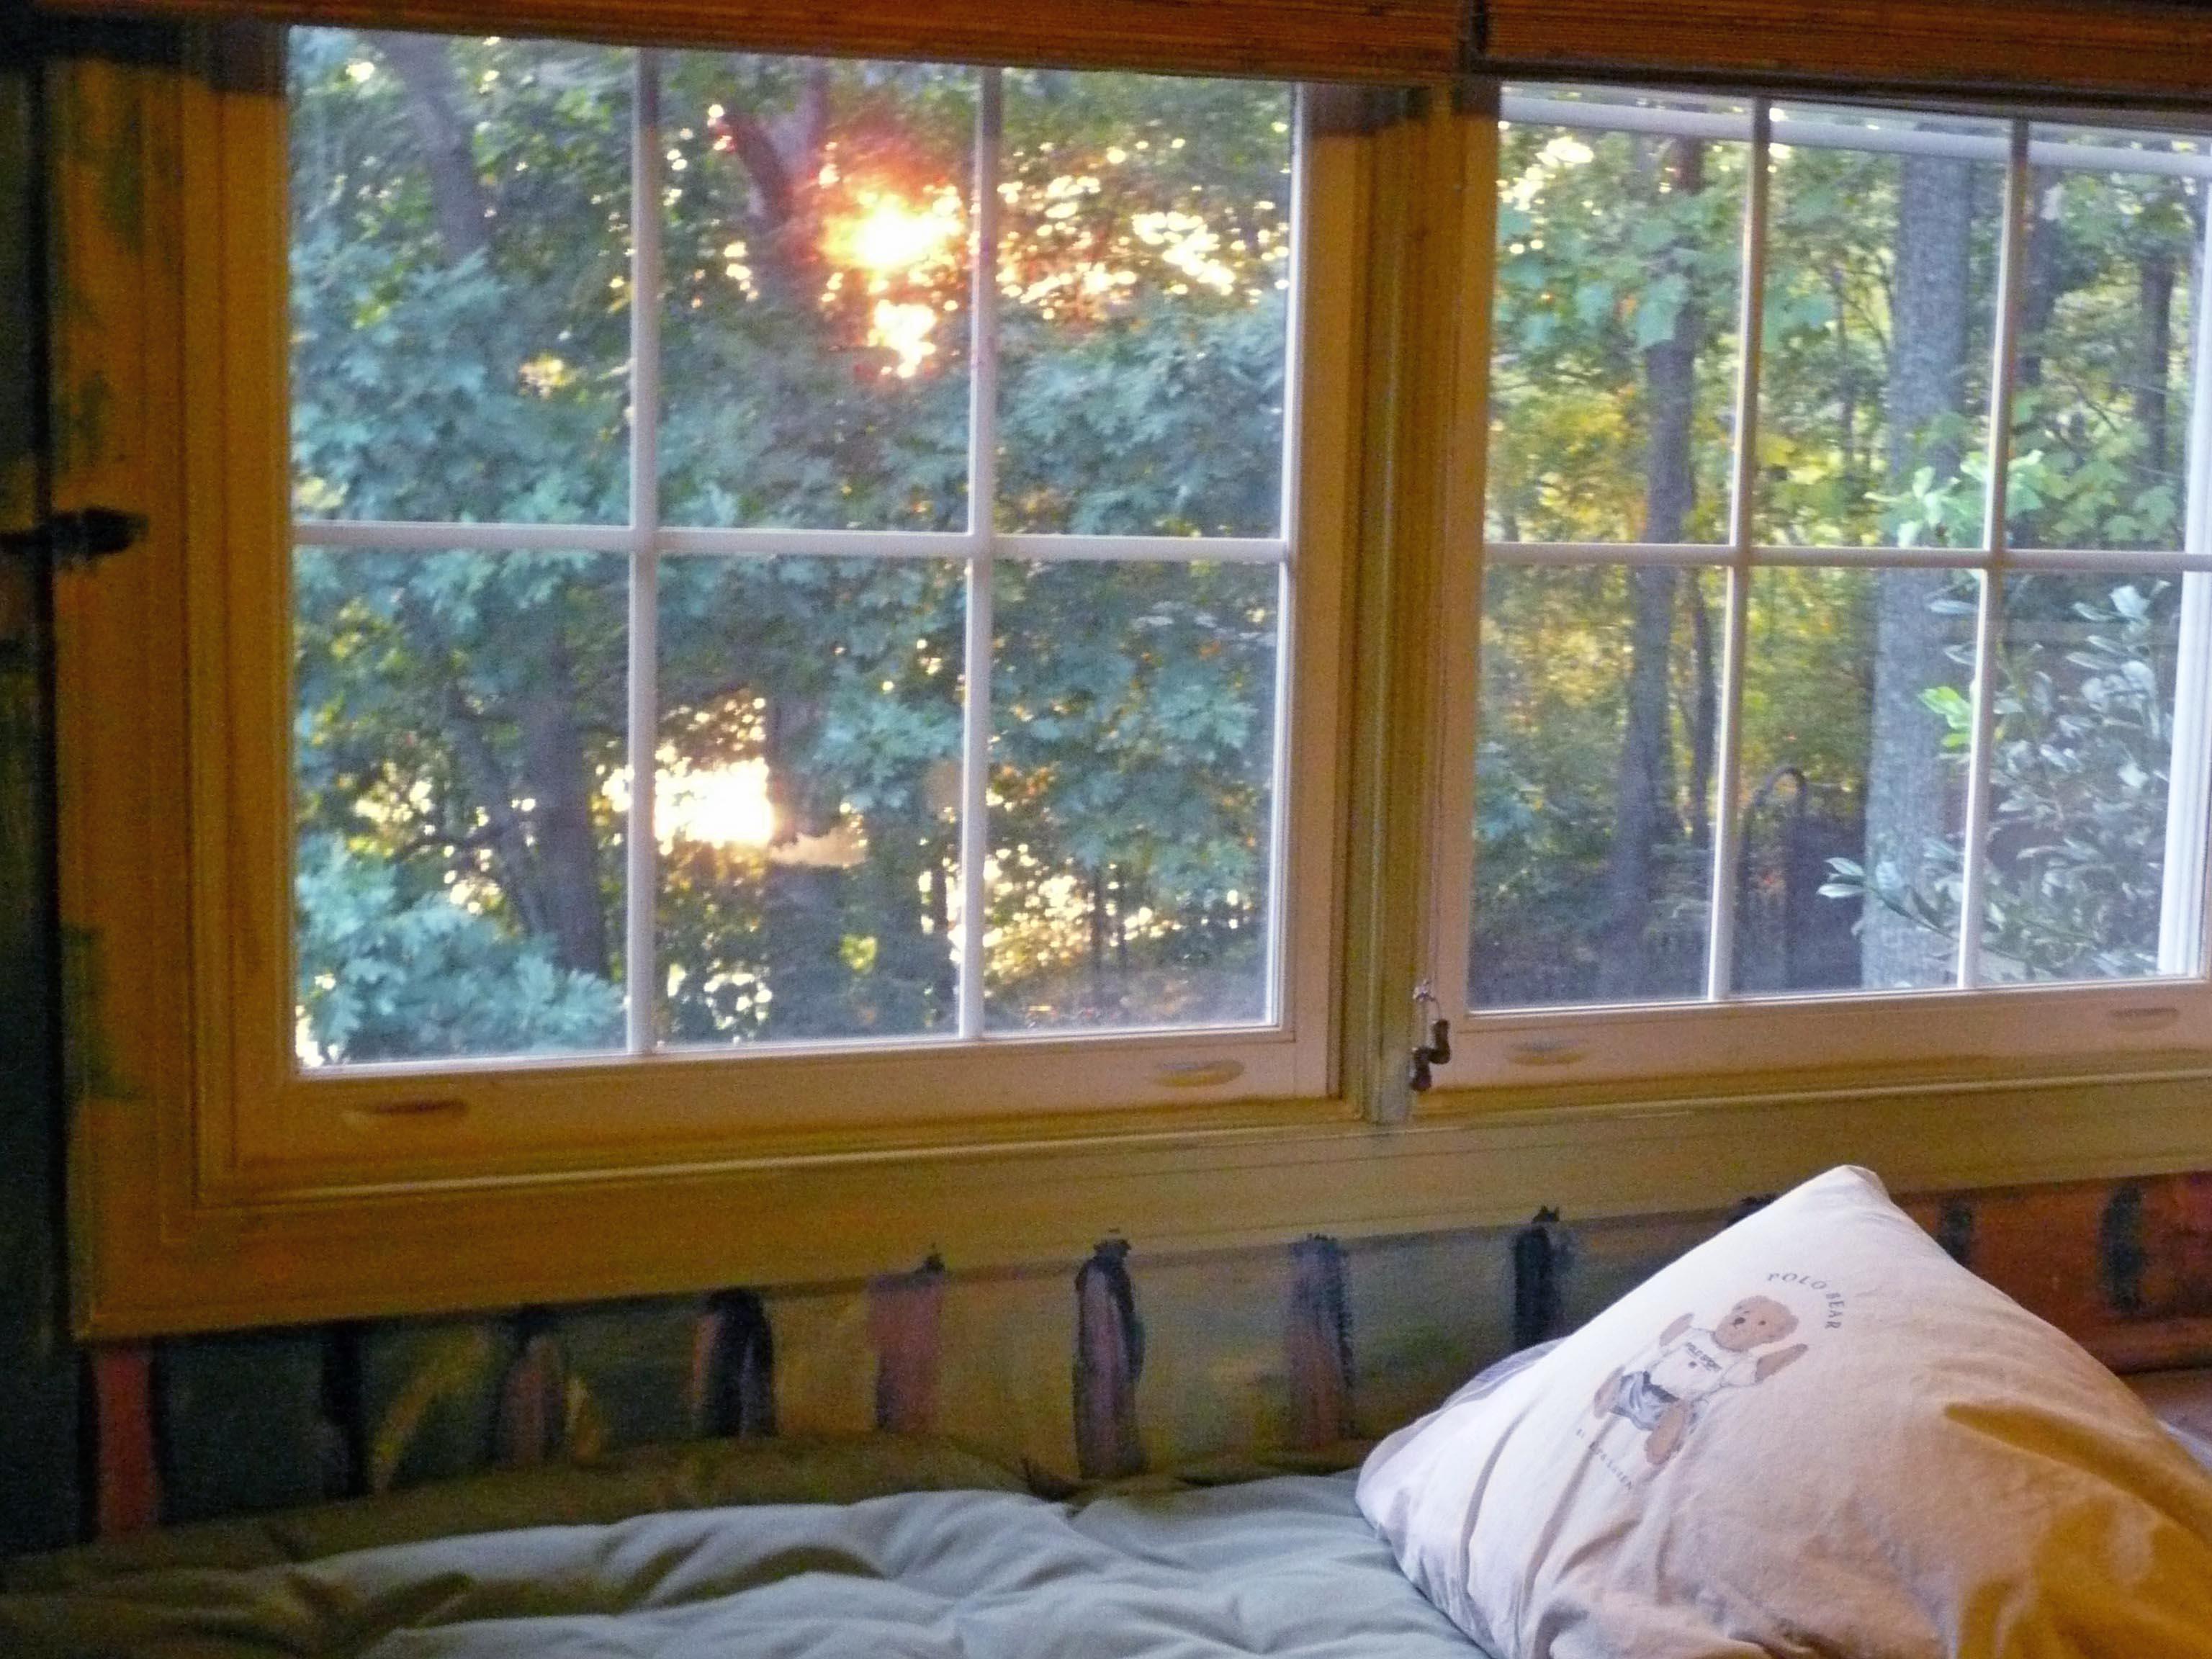 Justin's window